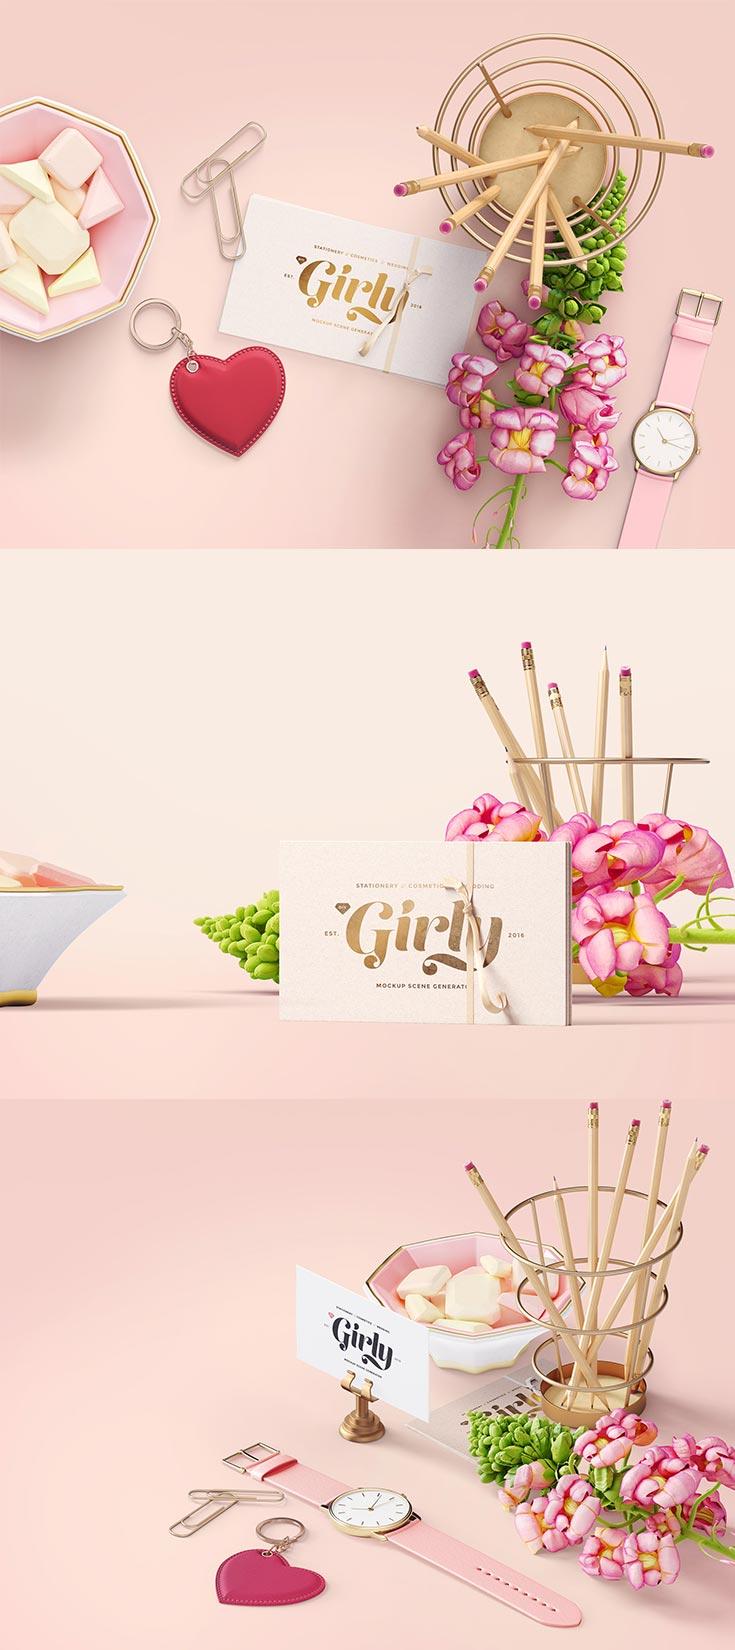 3 Free Girly Branding Mockups